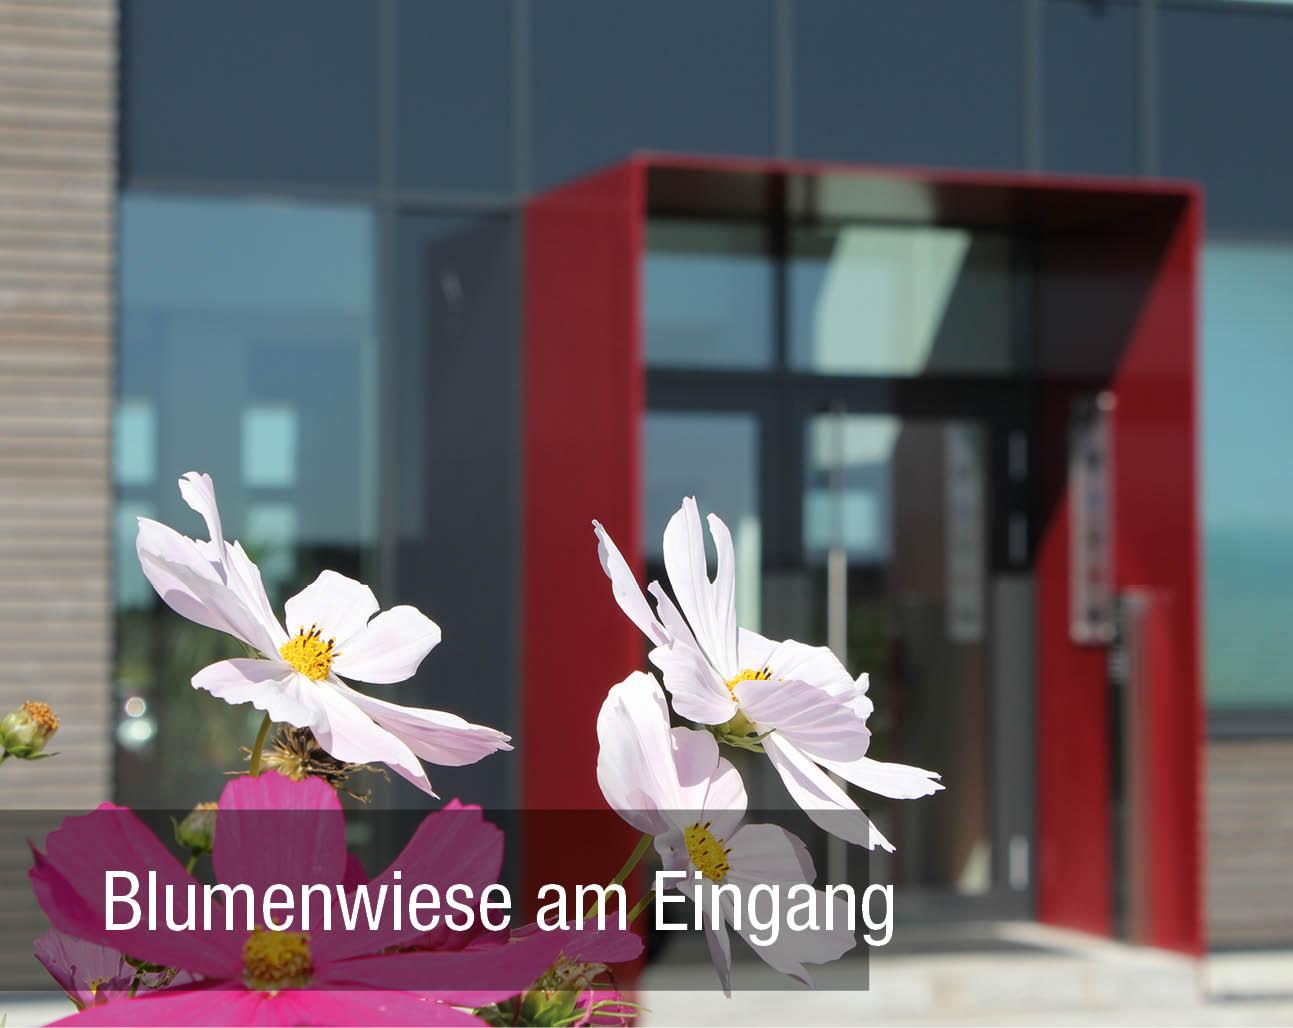 Blumenwiese am Eingang